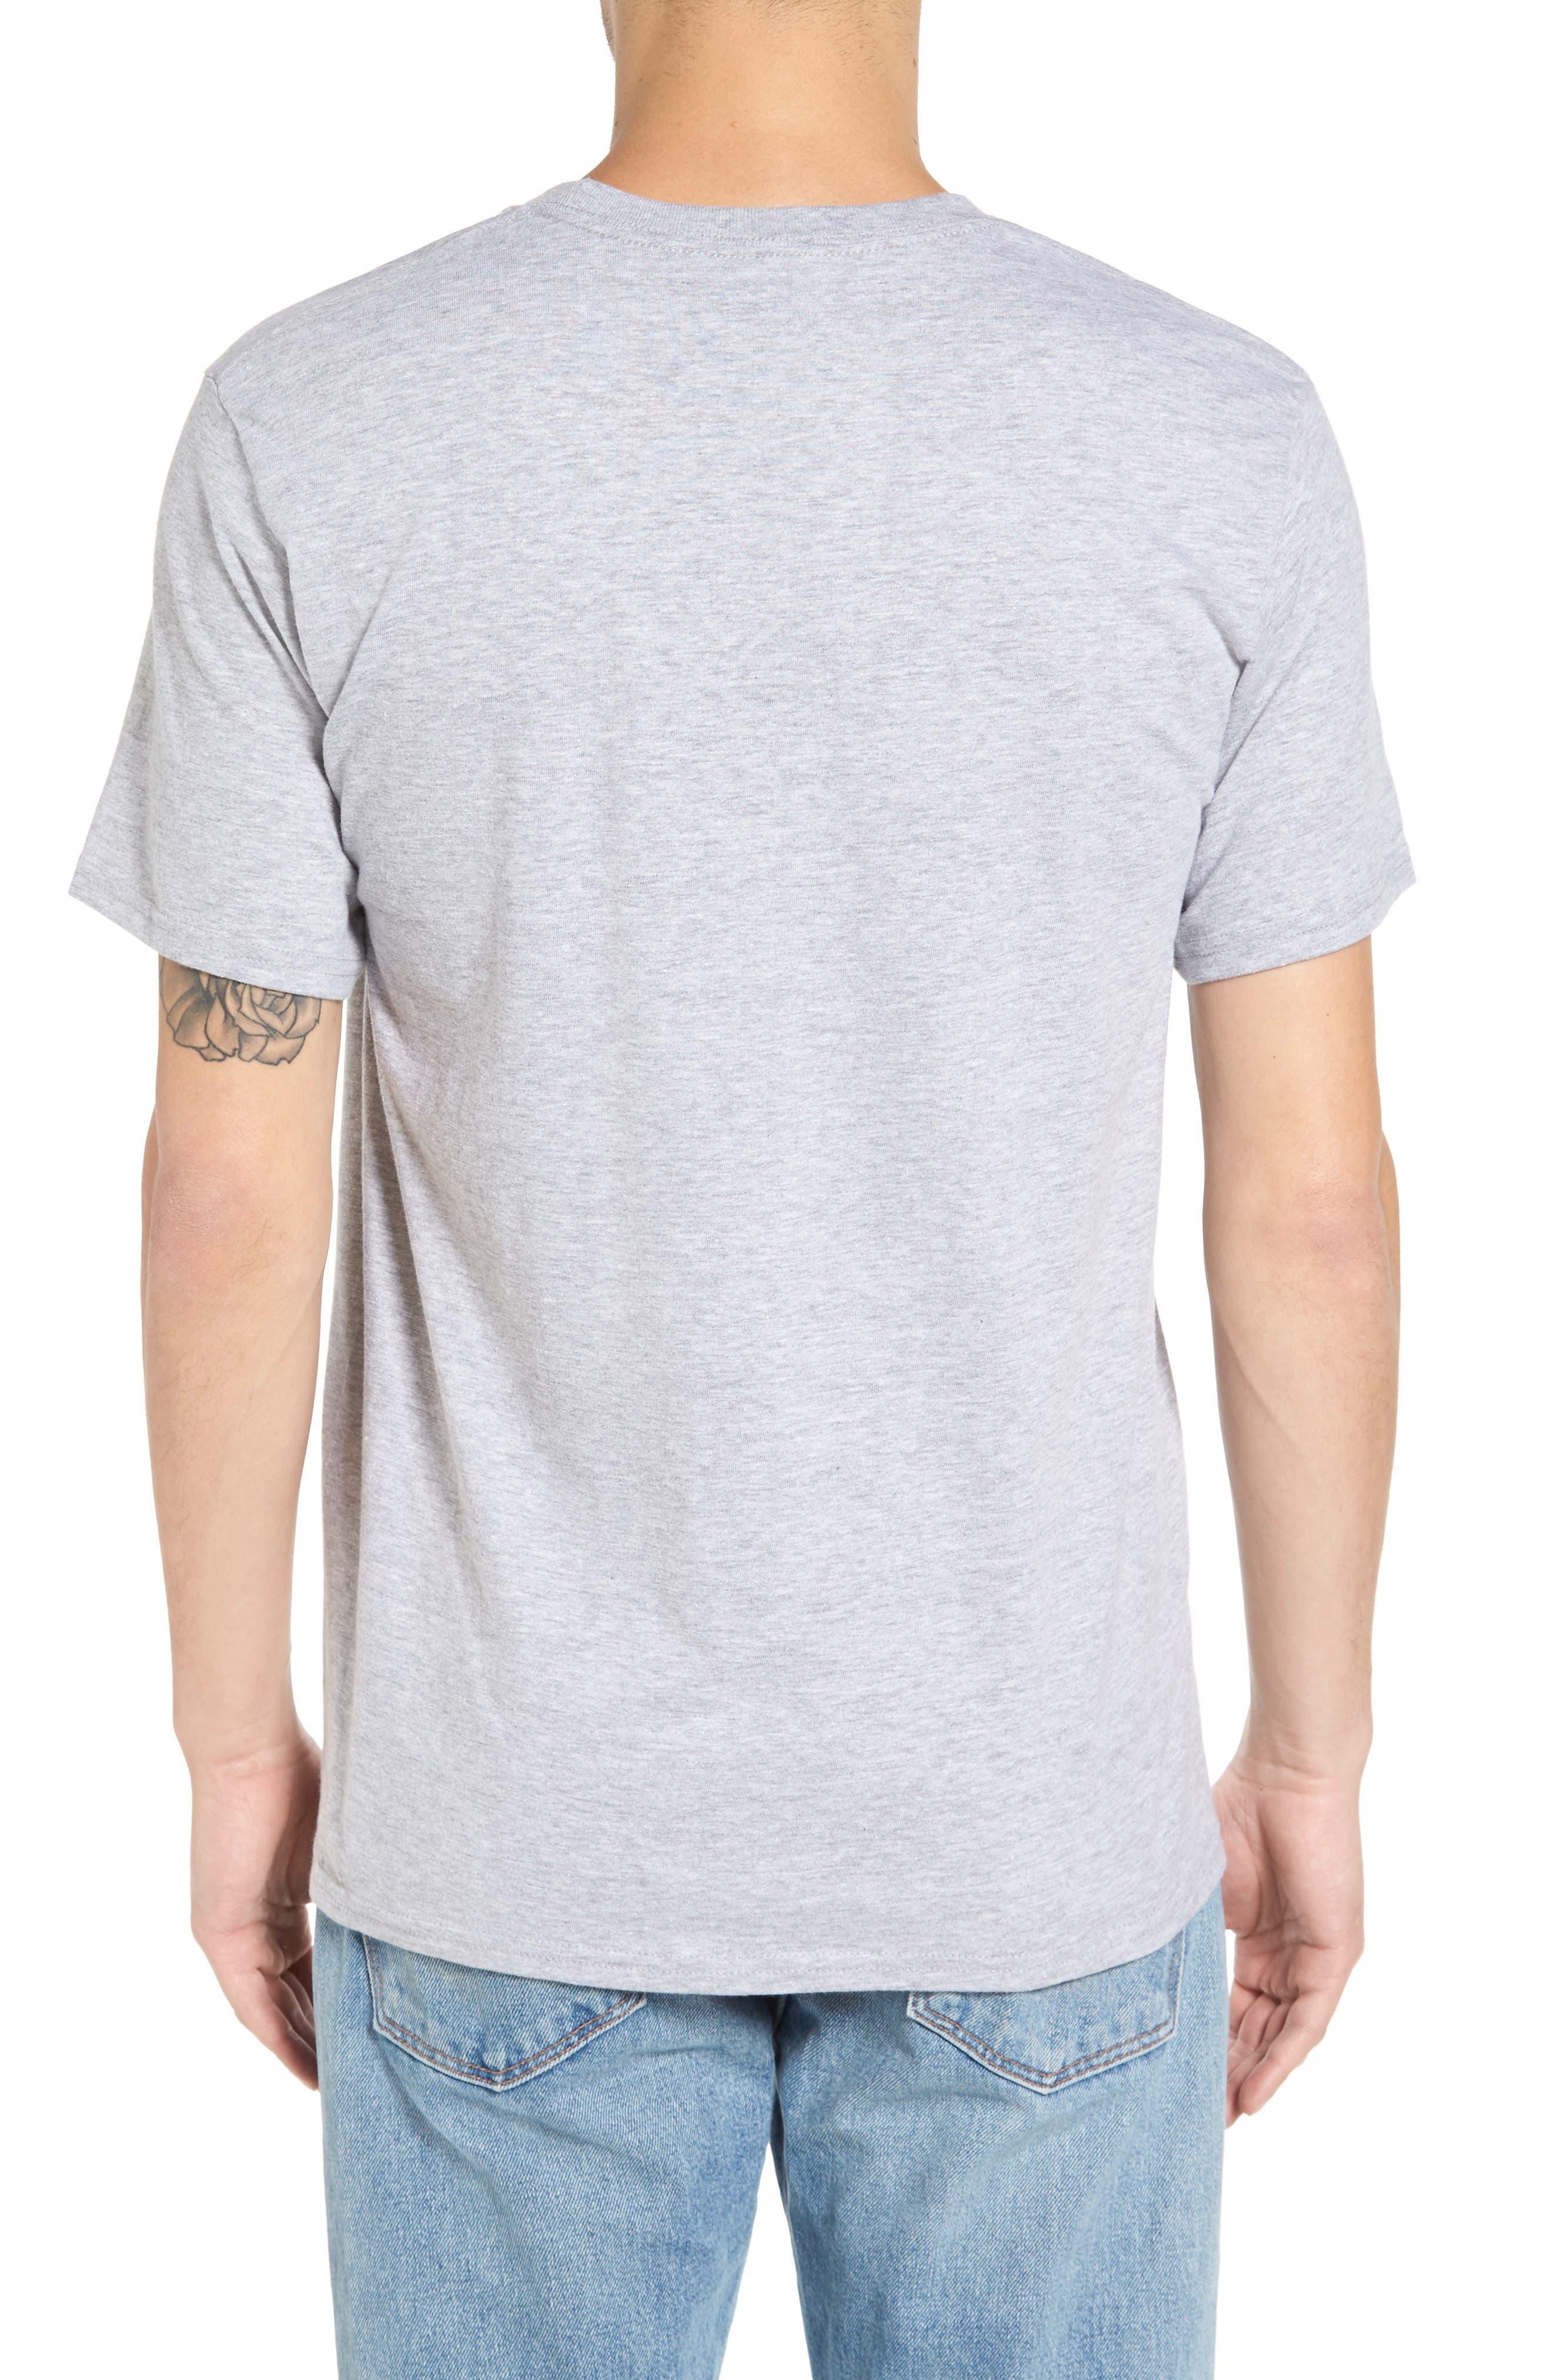 USA Graphic T-Shirt,                             Alternate thumbnail 9, color,